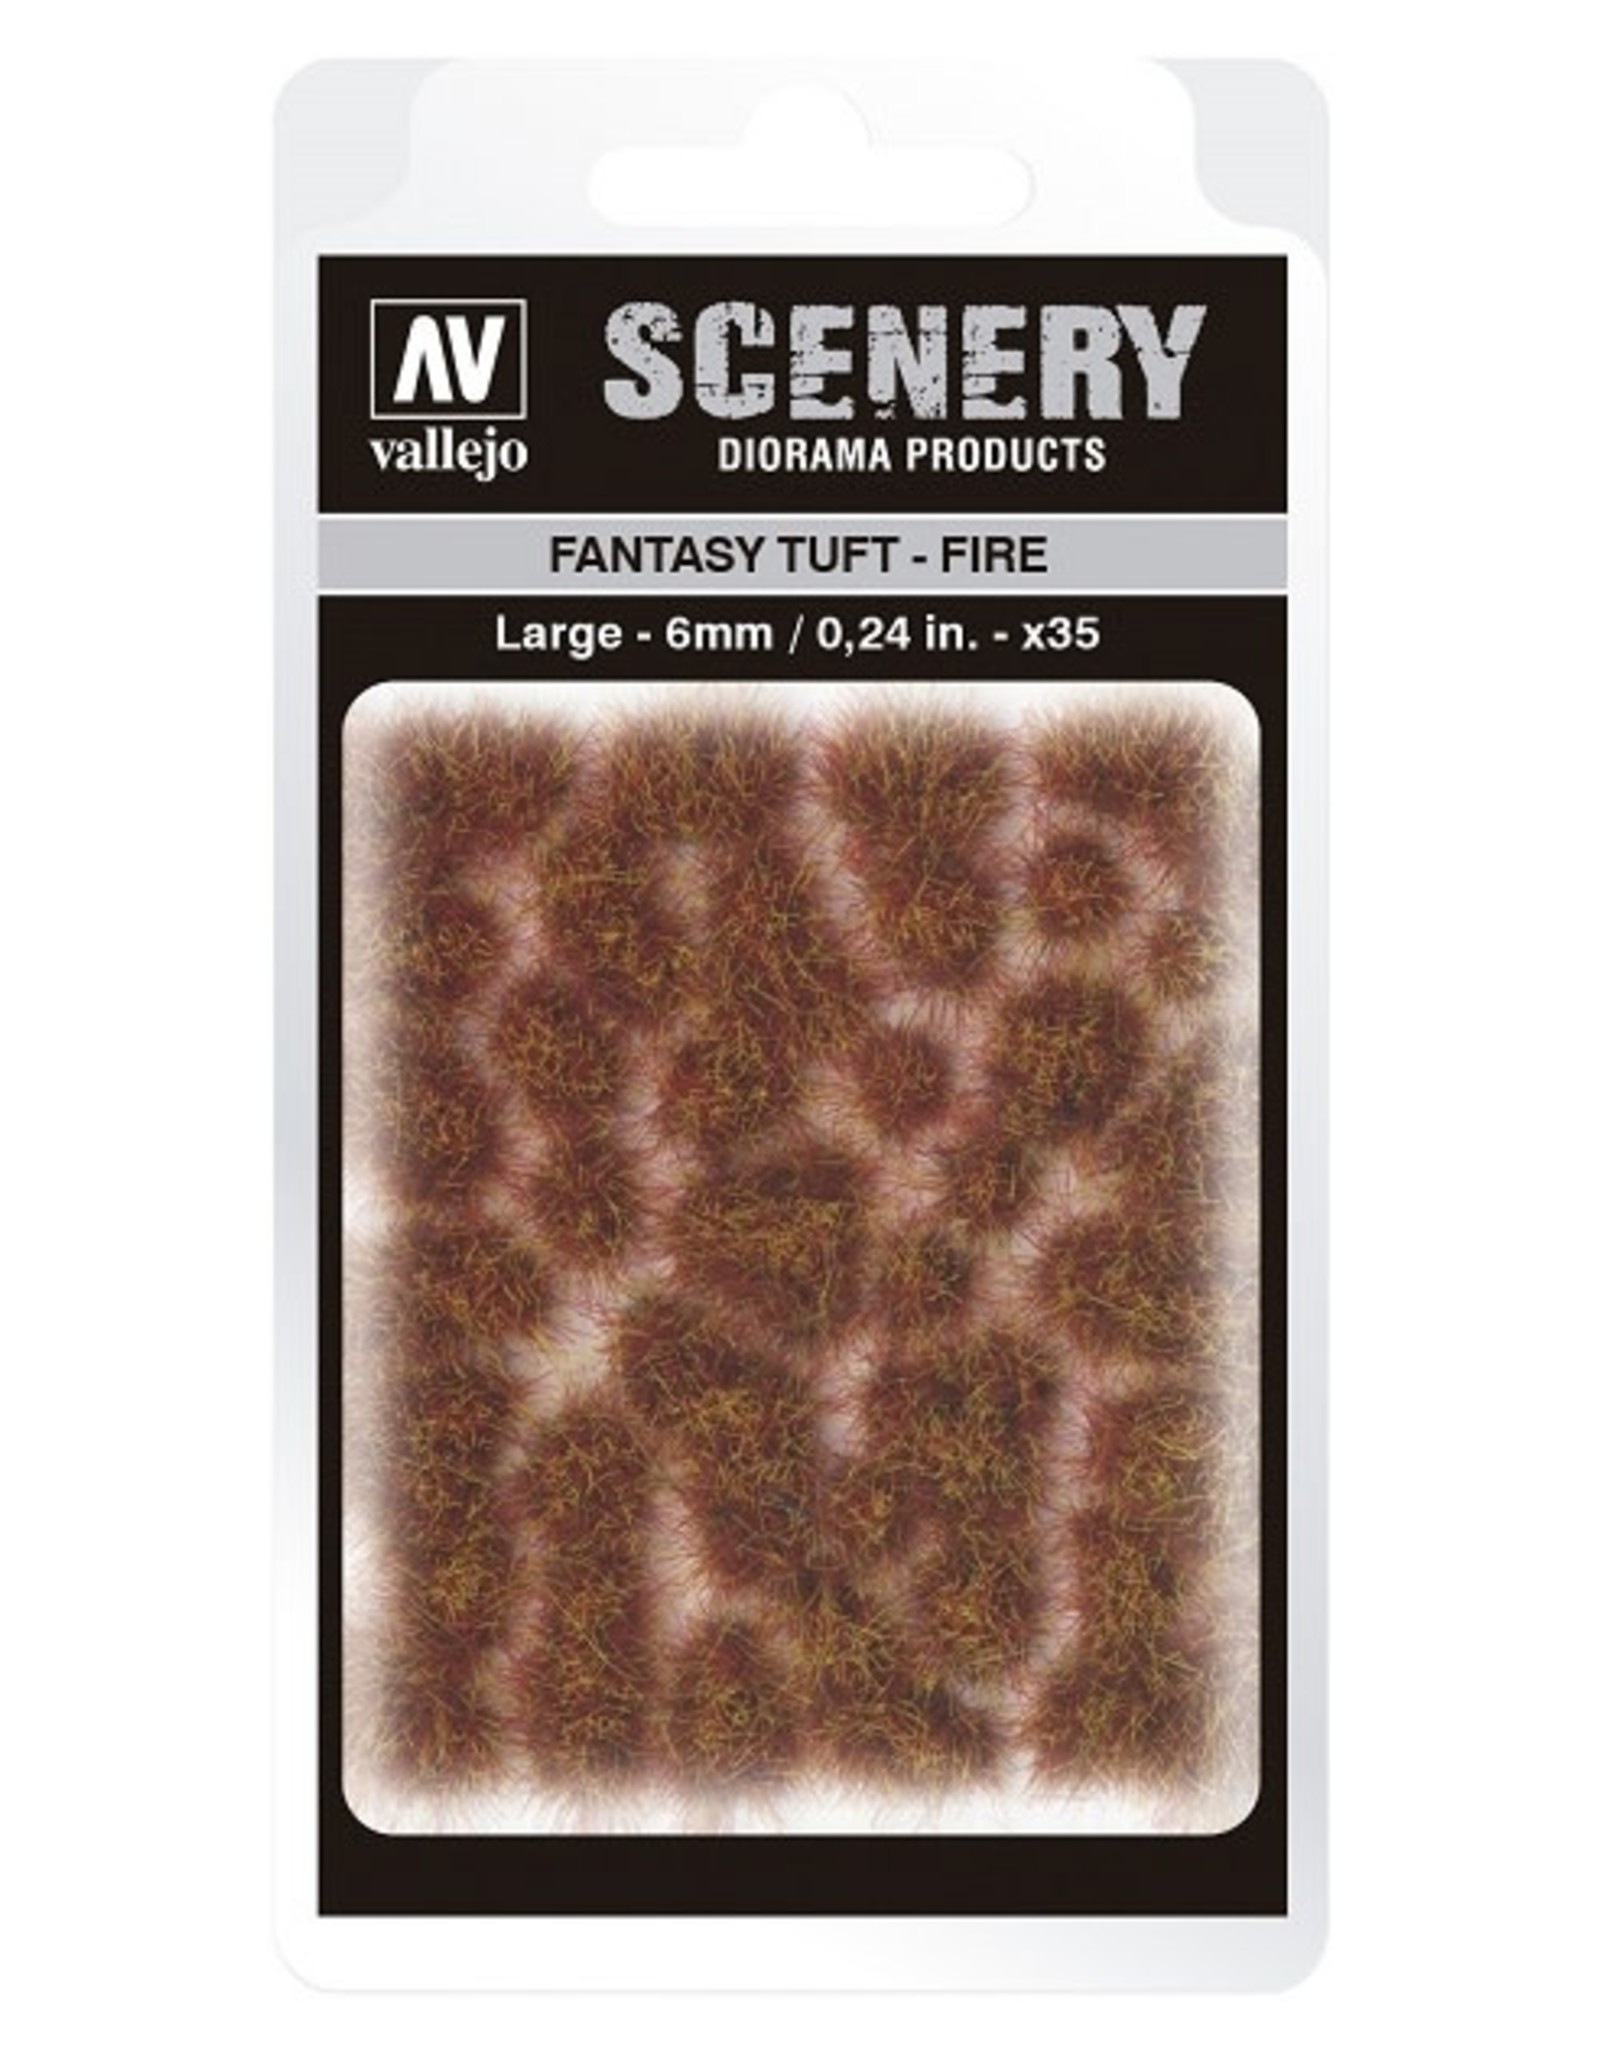 Vallejo Vallejo: Scenery - Fantasy Tuft - Fire Large 6mm